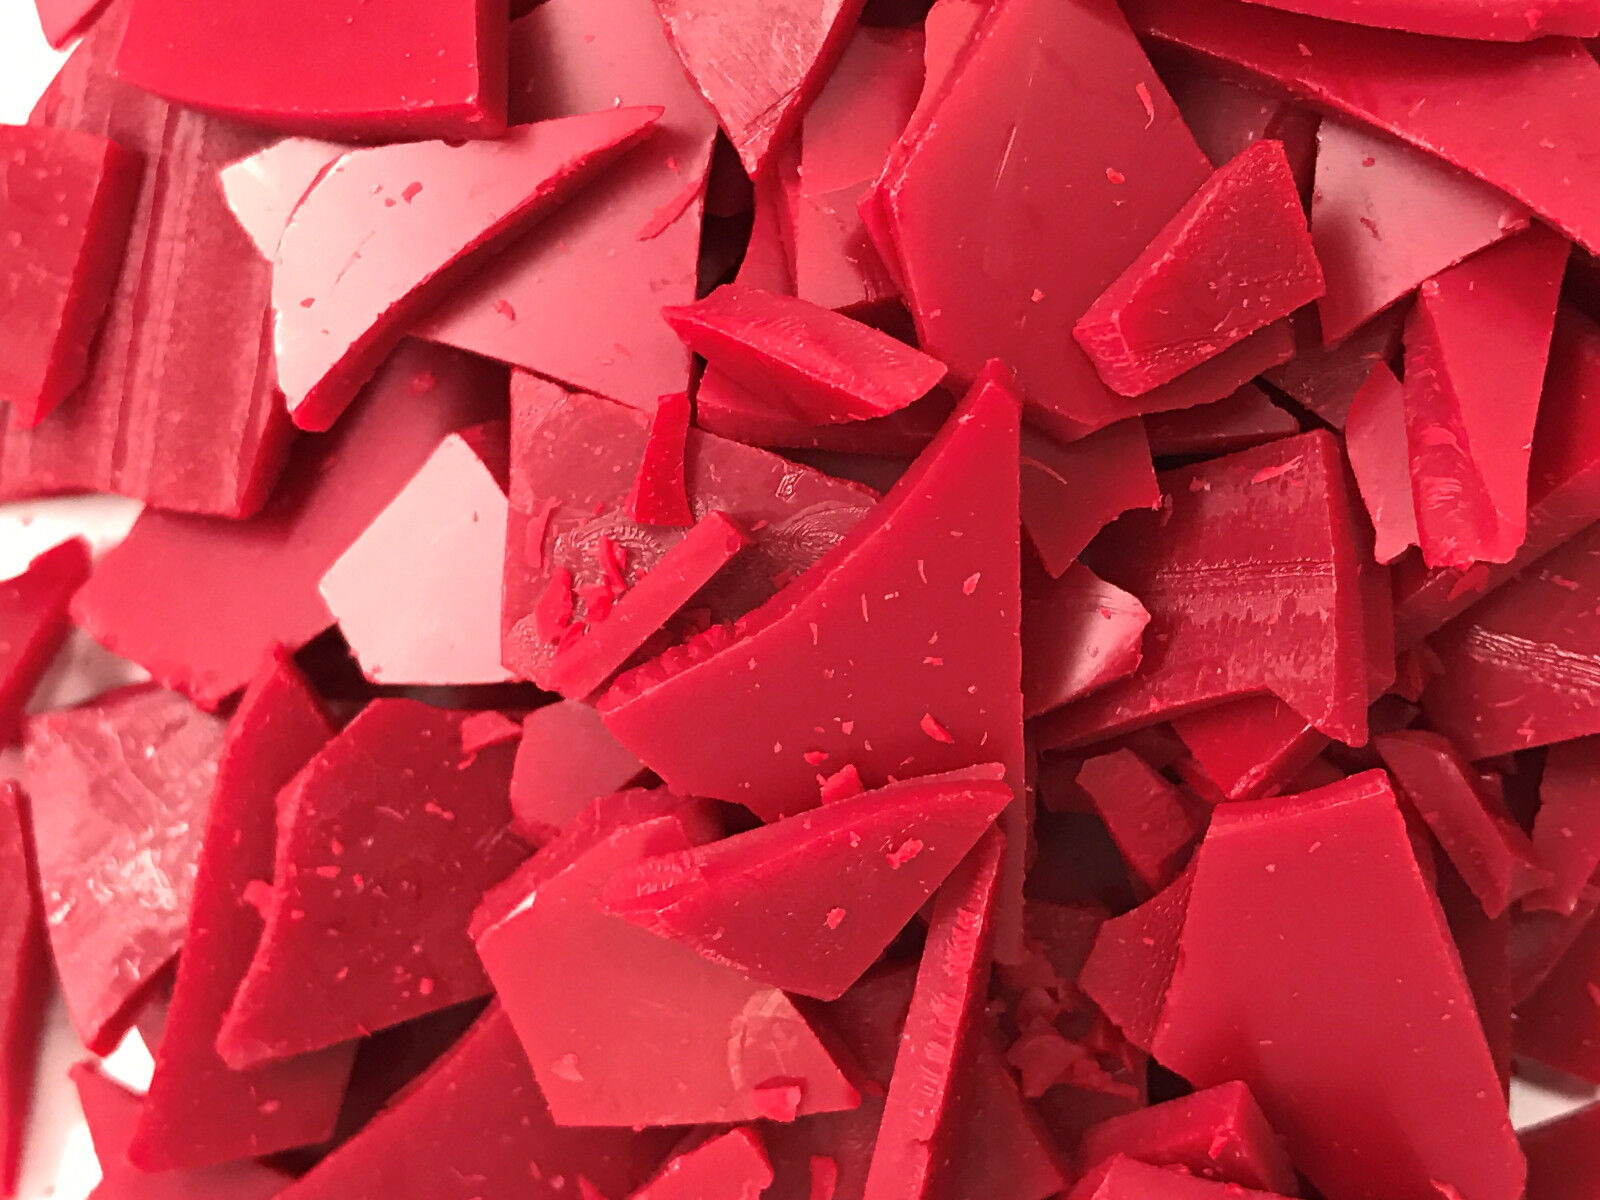 Jewelry Ruby Red Injection Wax Freeman Wax Casting Ferris...